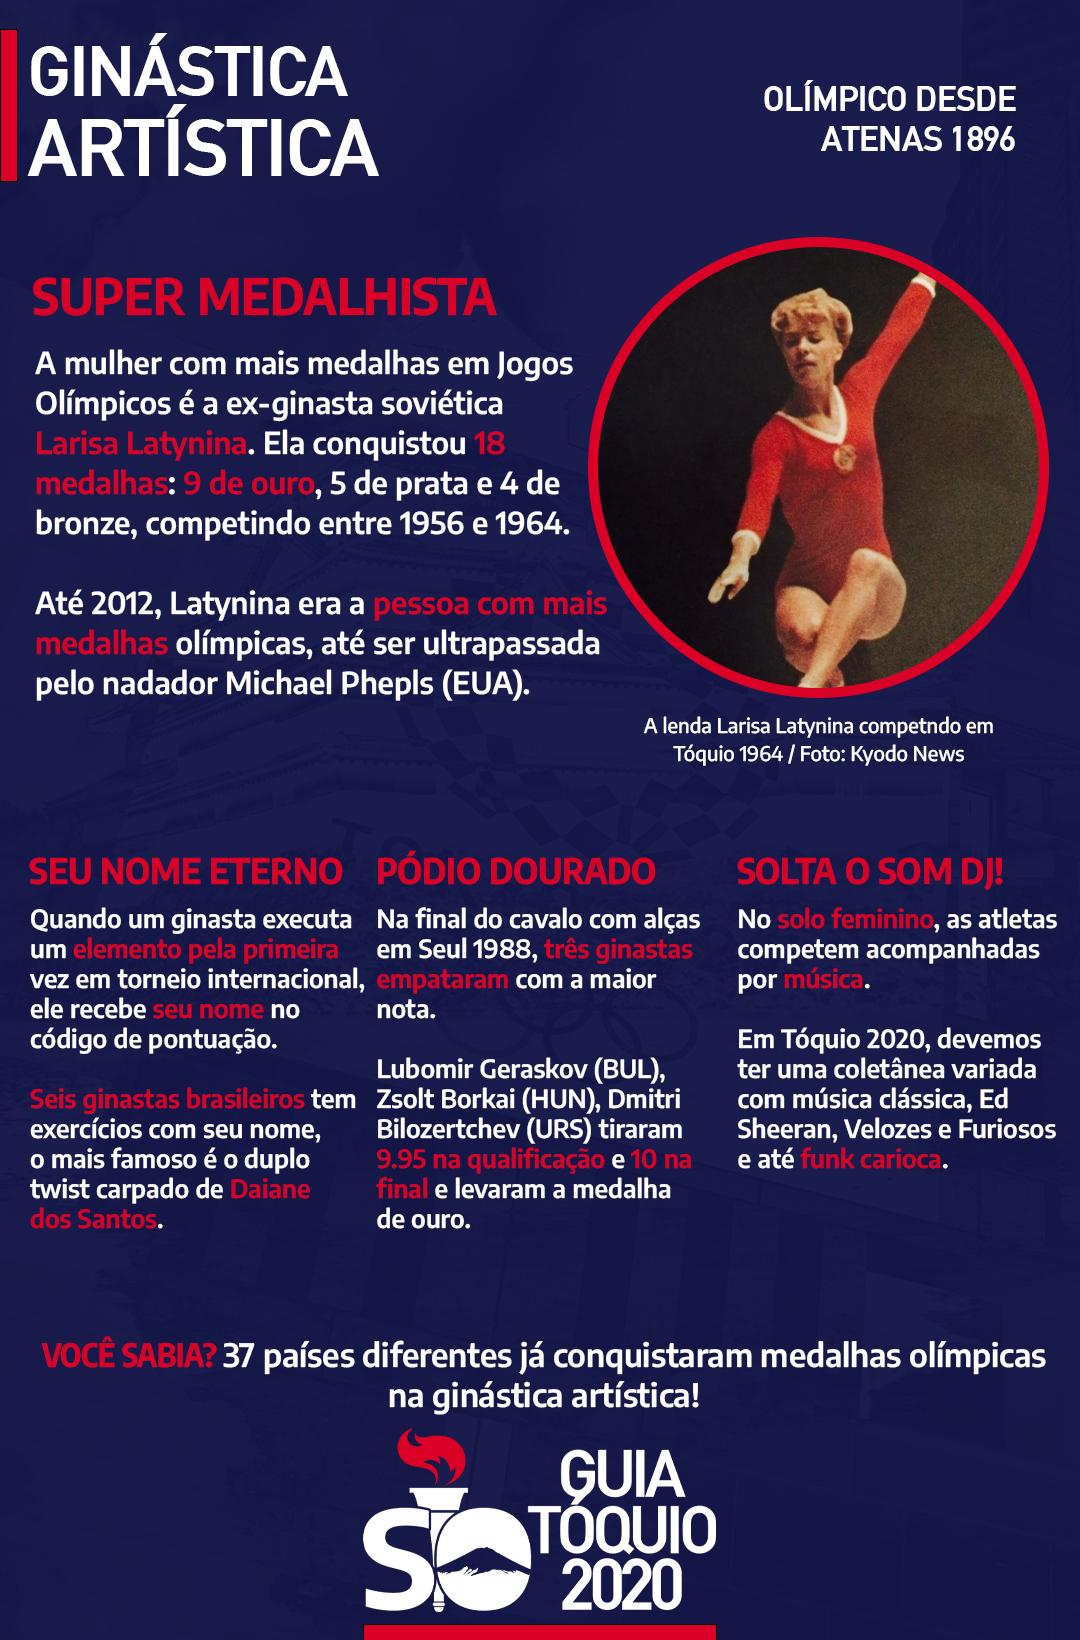 Maiores medalhistas ginástica artística Olimpíadas